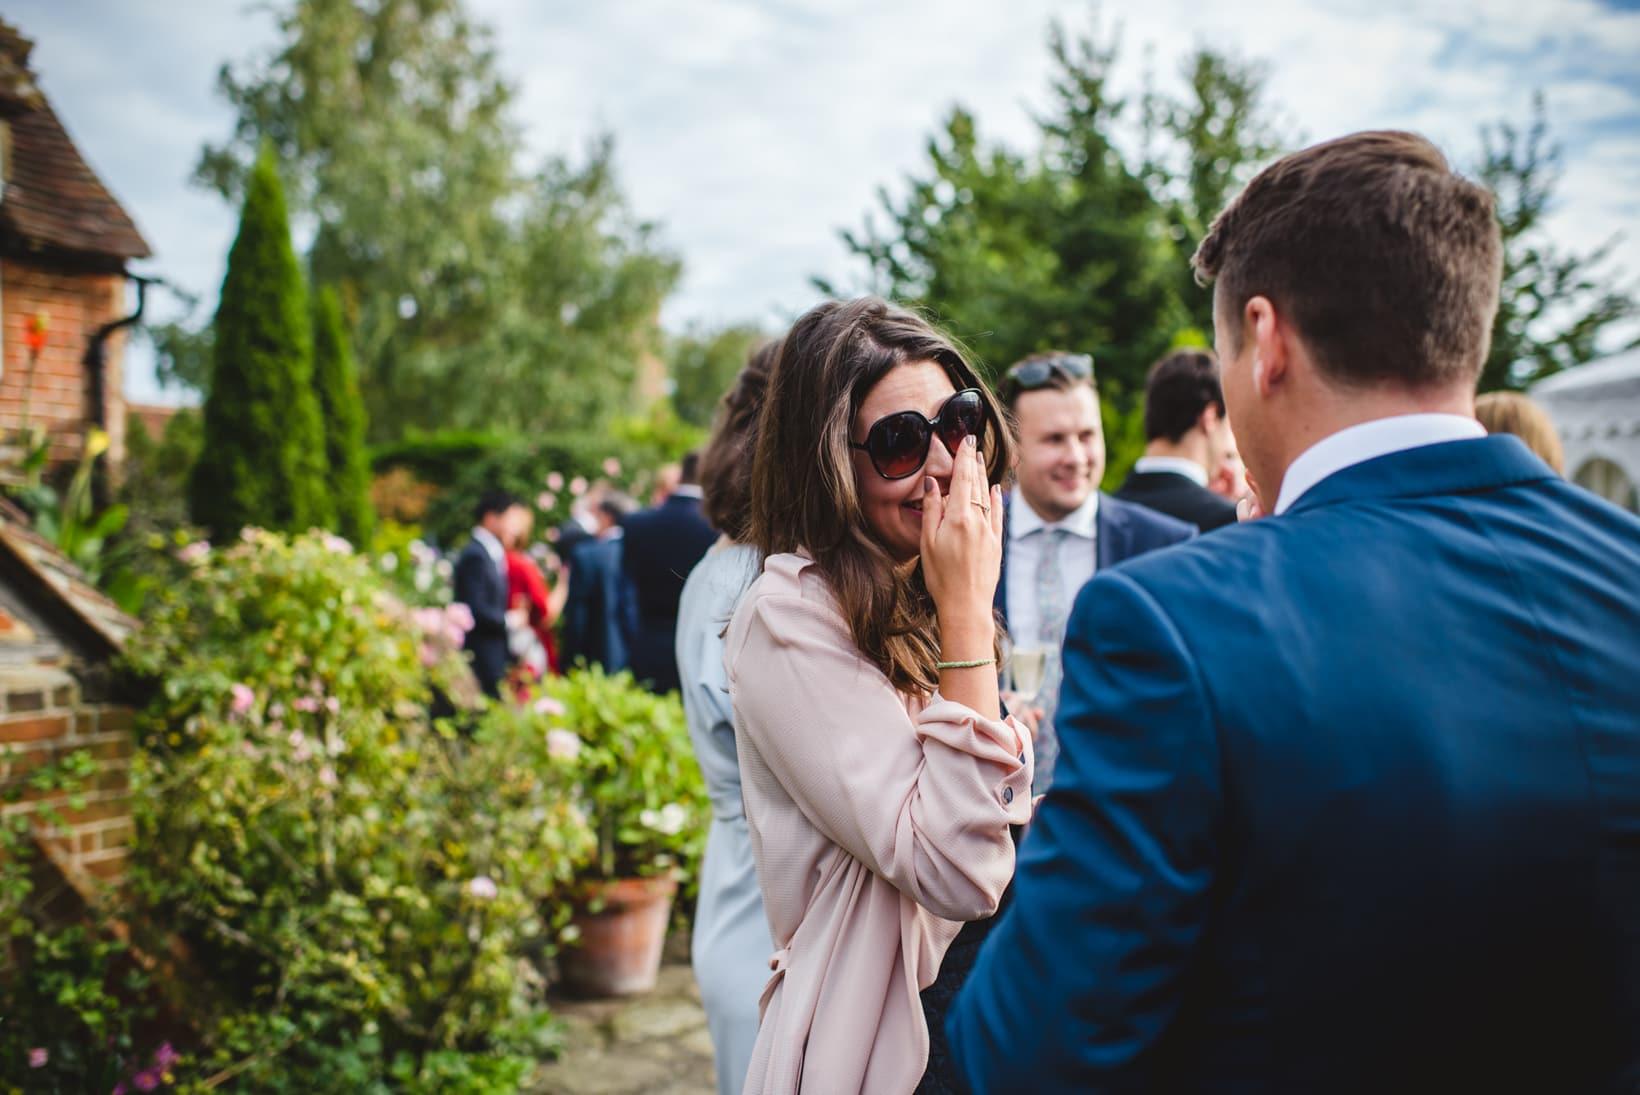 Lucy Simon Surrey Garden Marquee wedding Sophie Duckworth Photography